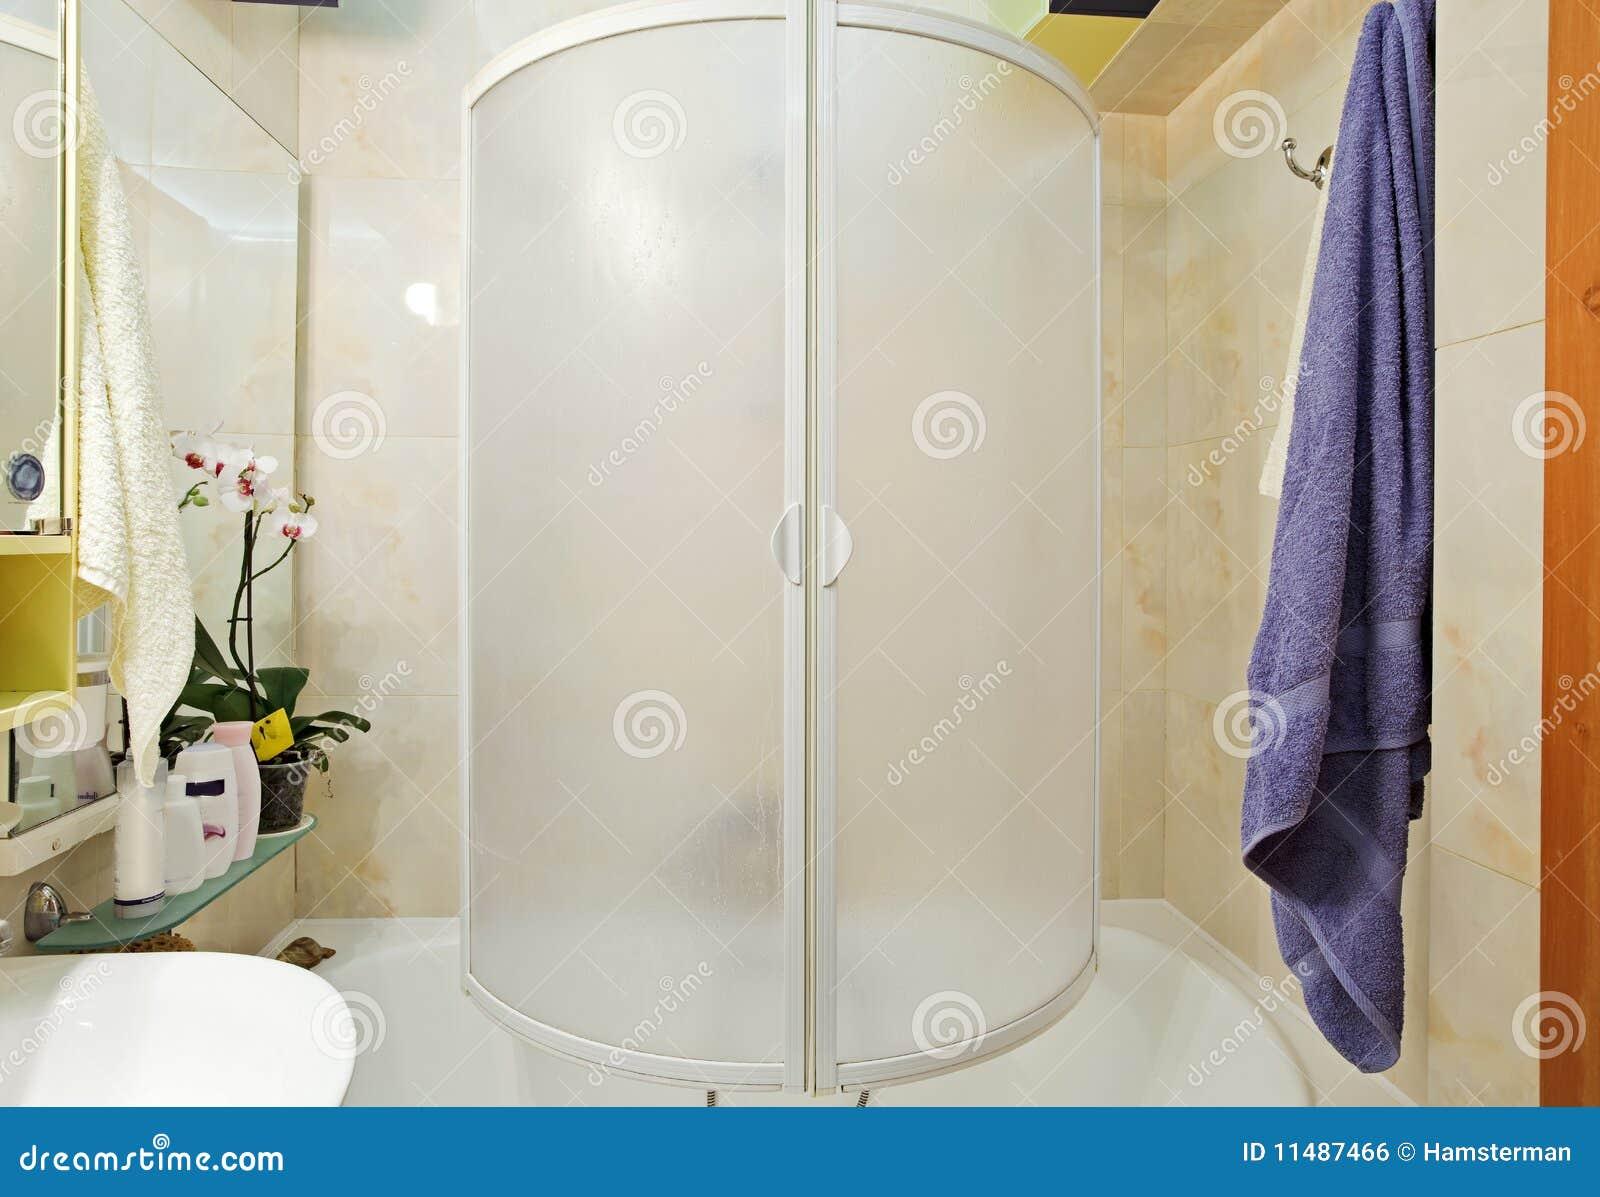 Baños Azules Modernos:Pequeño Regar-baño Moderno Con La Toalla Azul Imagen de archivo